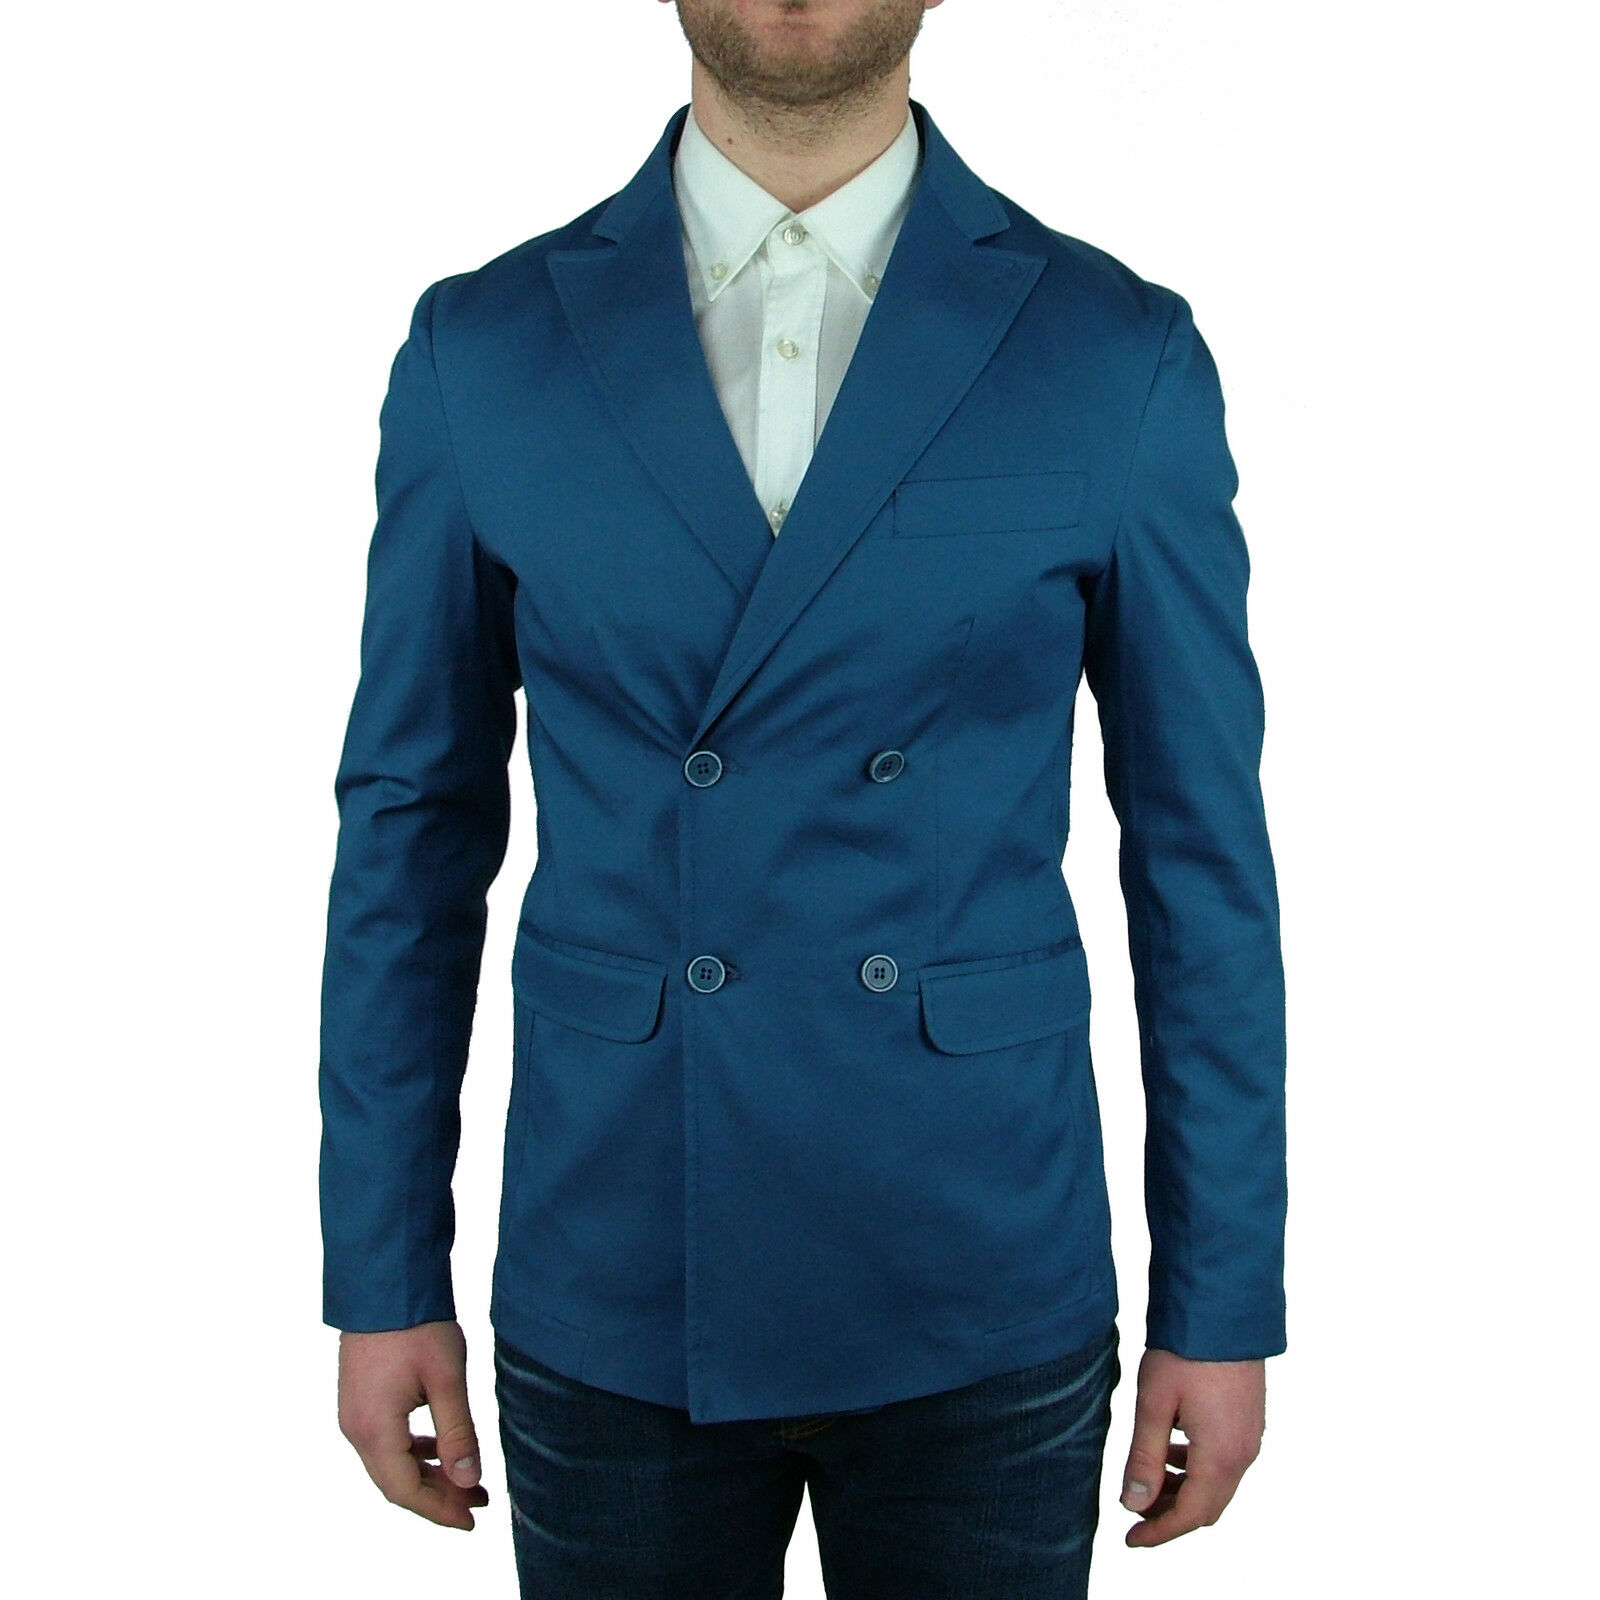 Giacca Blazer Sportiva Primaverile Slim Fit Doppiopetto men Maskio blue Elegante